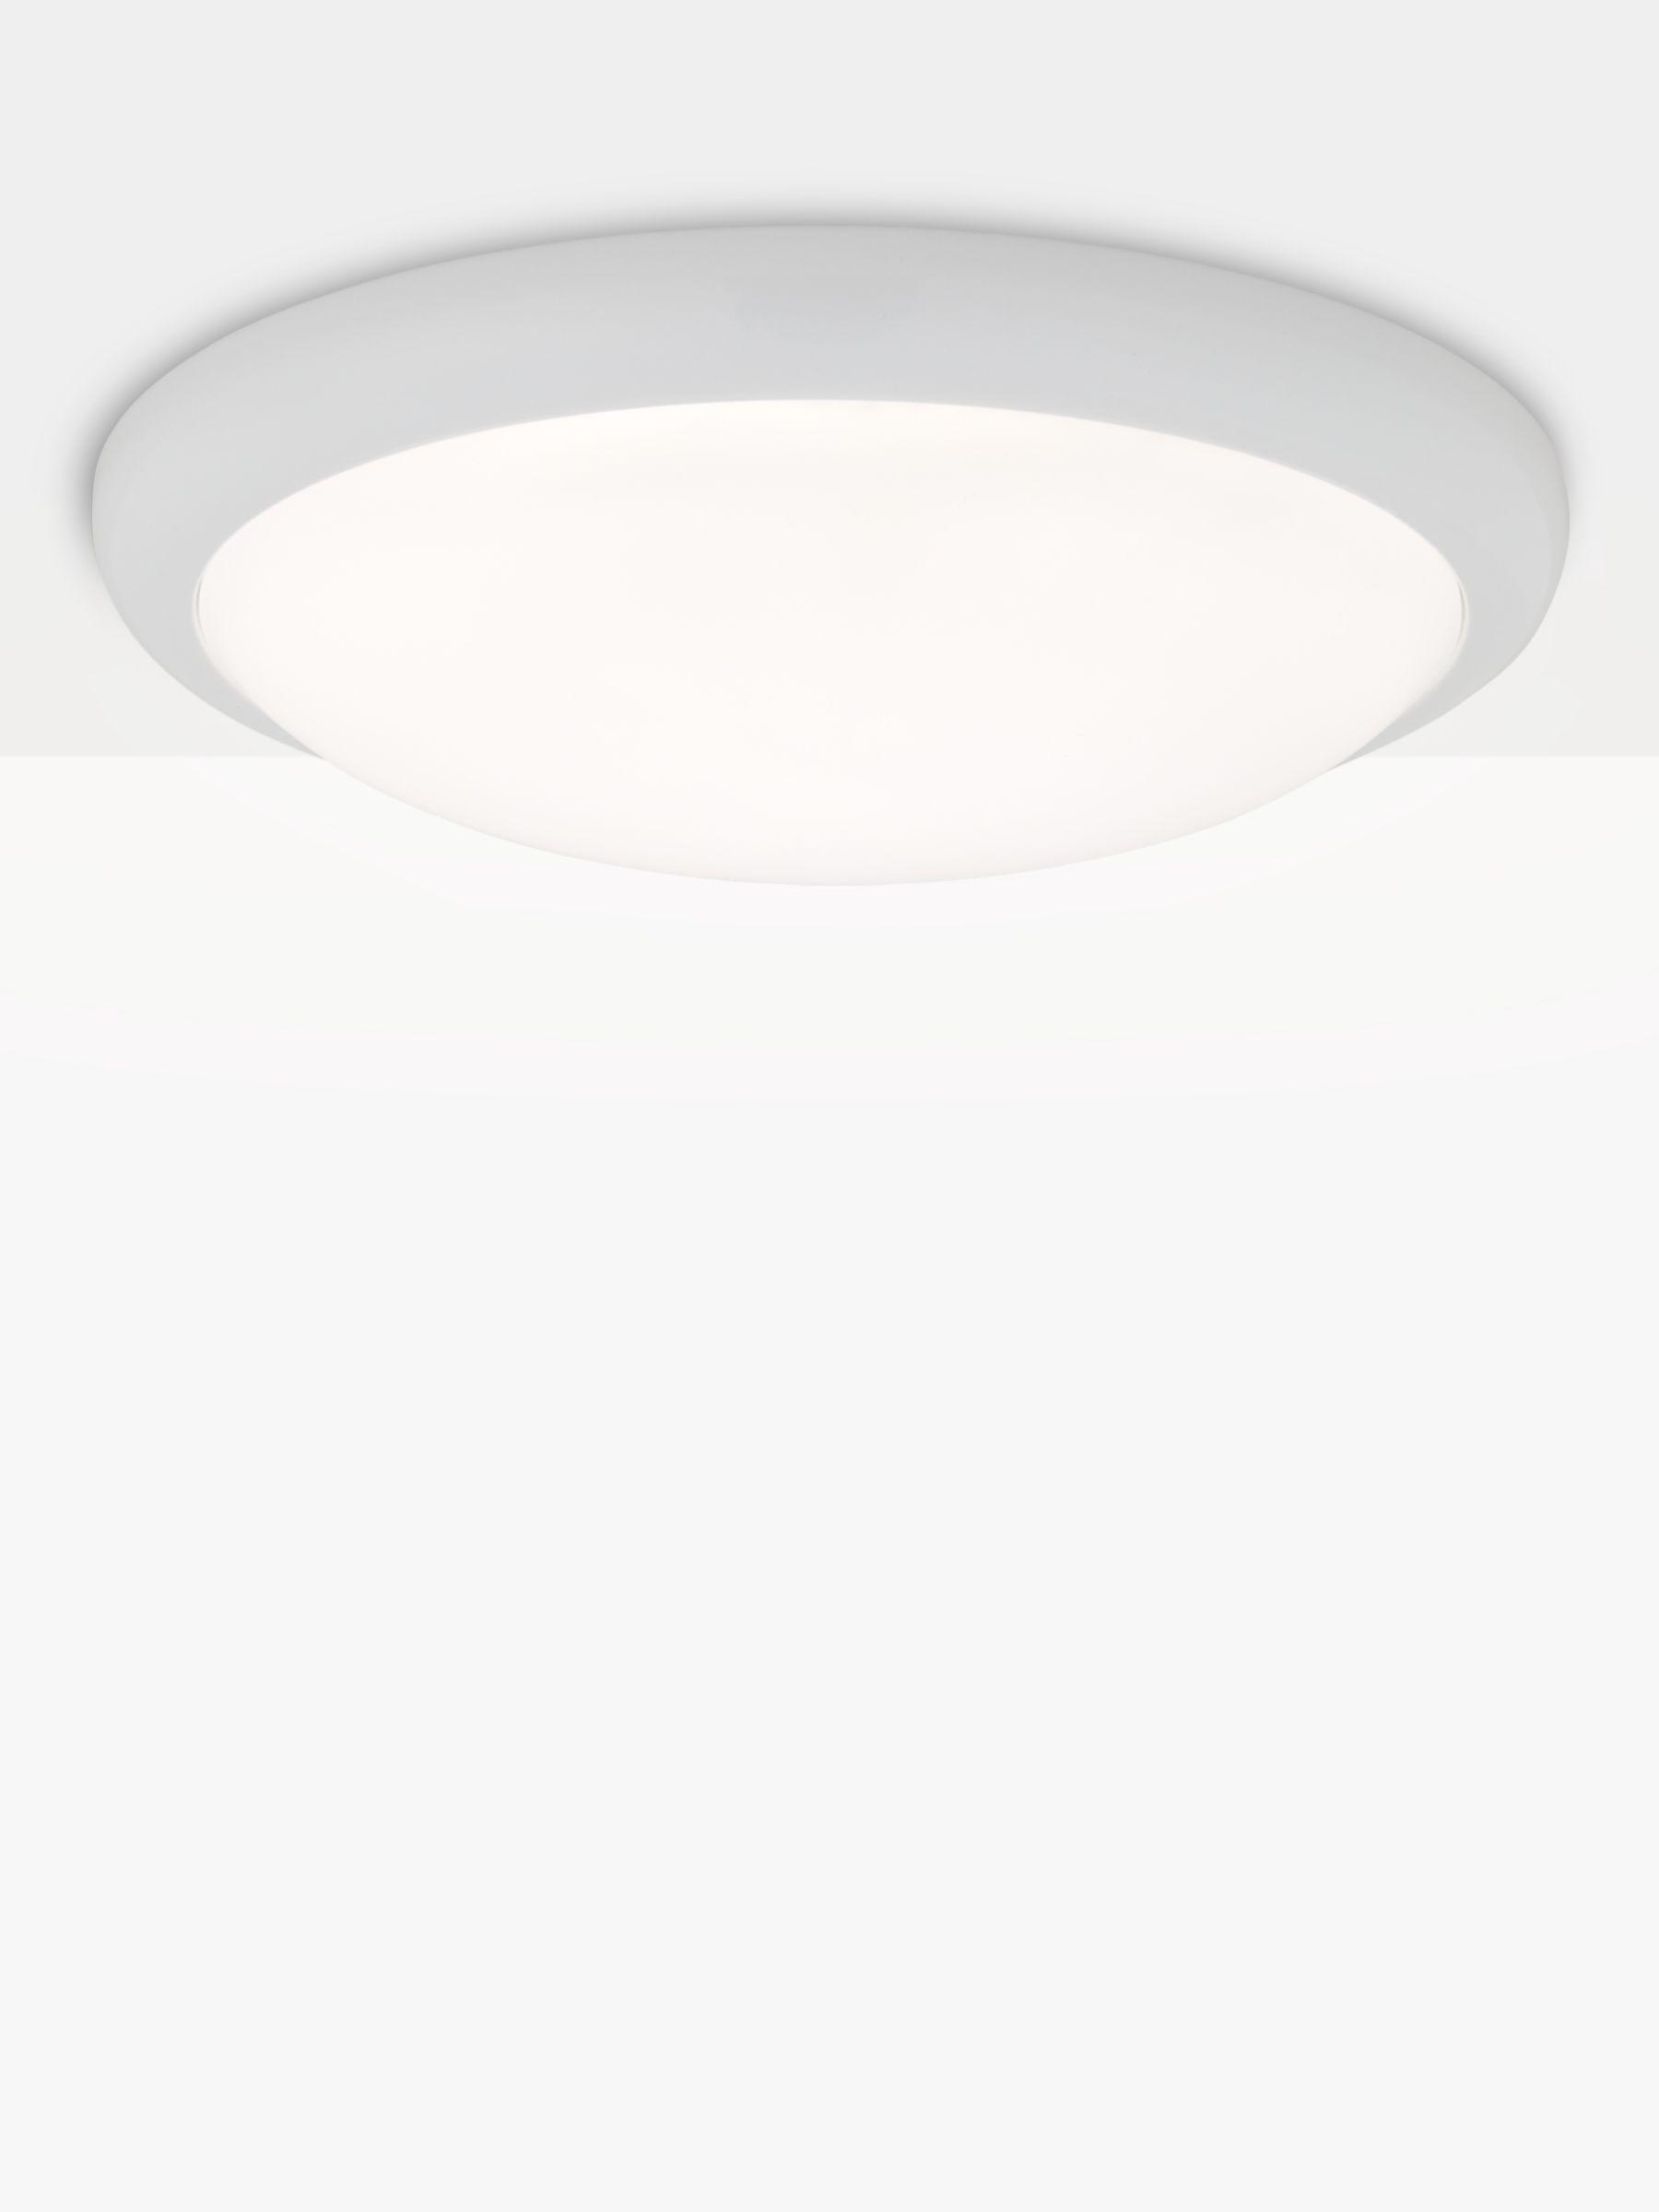 Saxby Saxby Montana LED Flush Ceiling Light, White